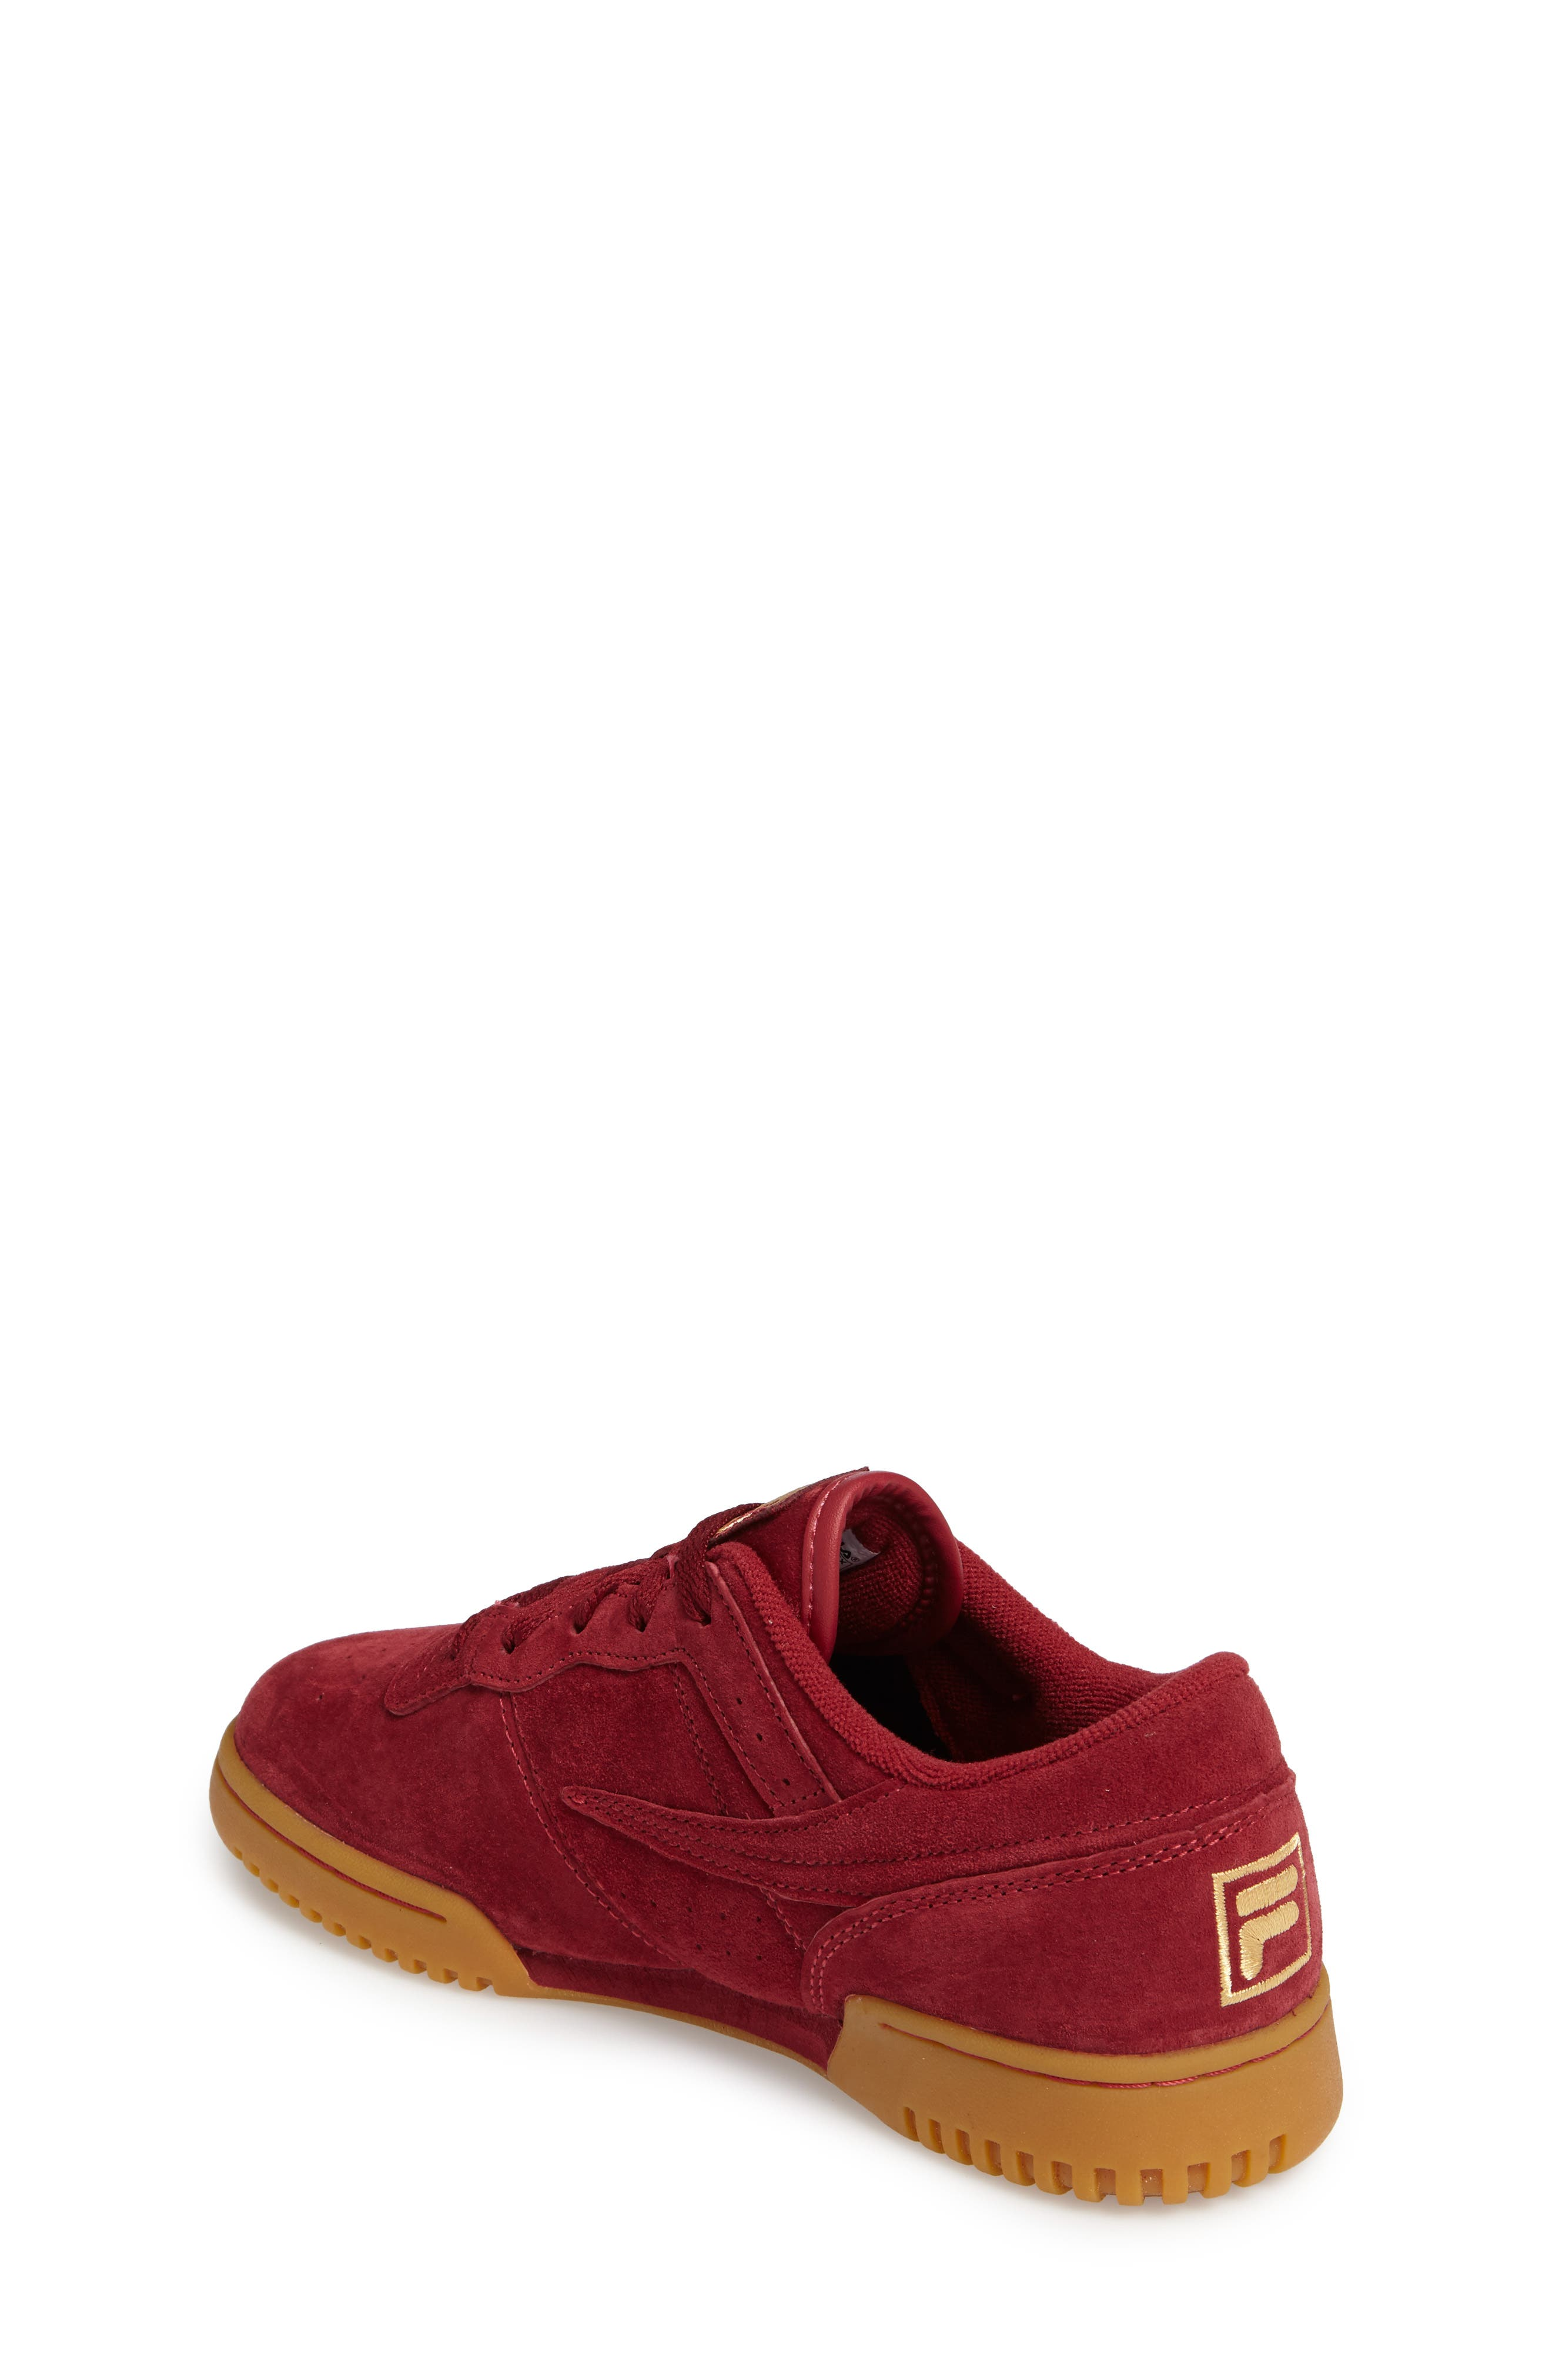 Heritage Sneaker,                             Alternate thumbnail 2, color,                             600